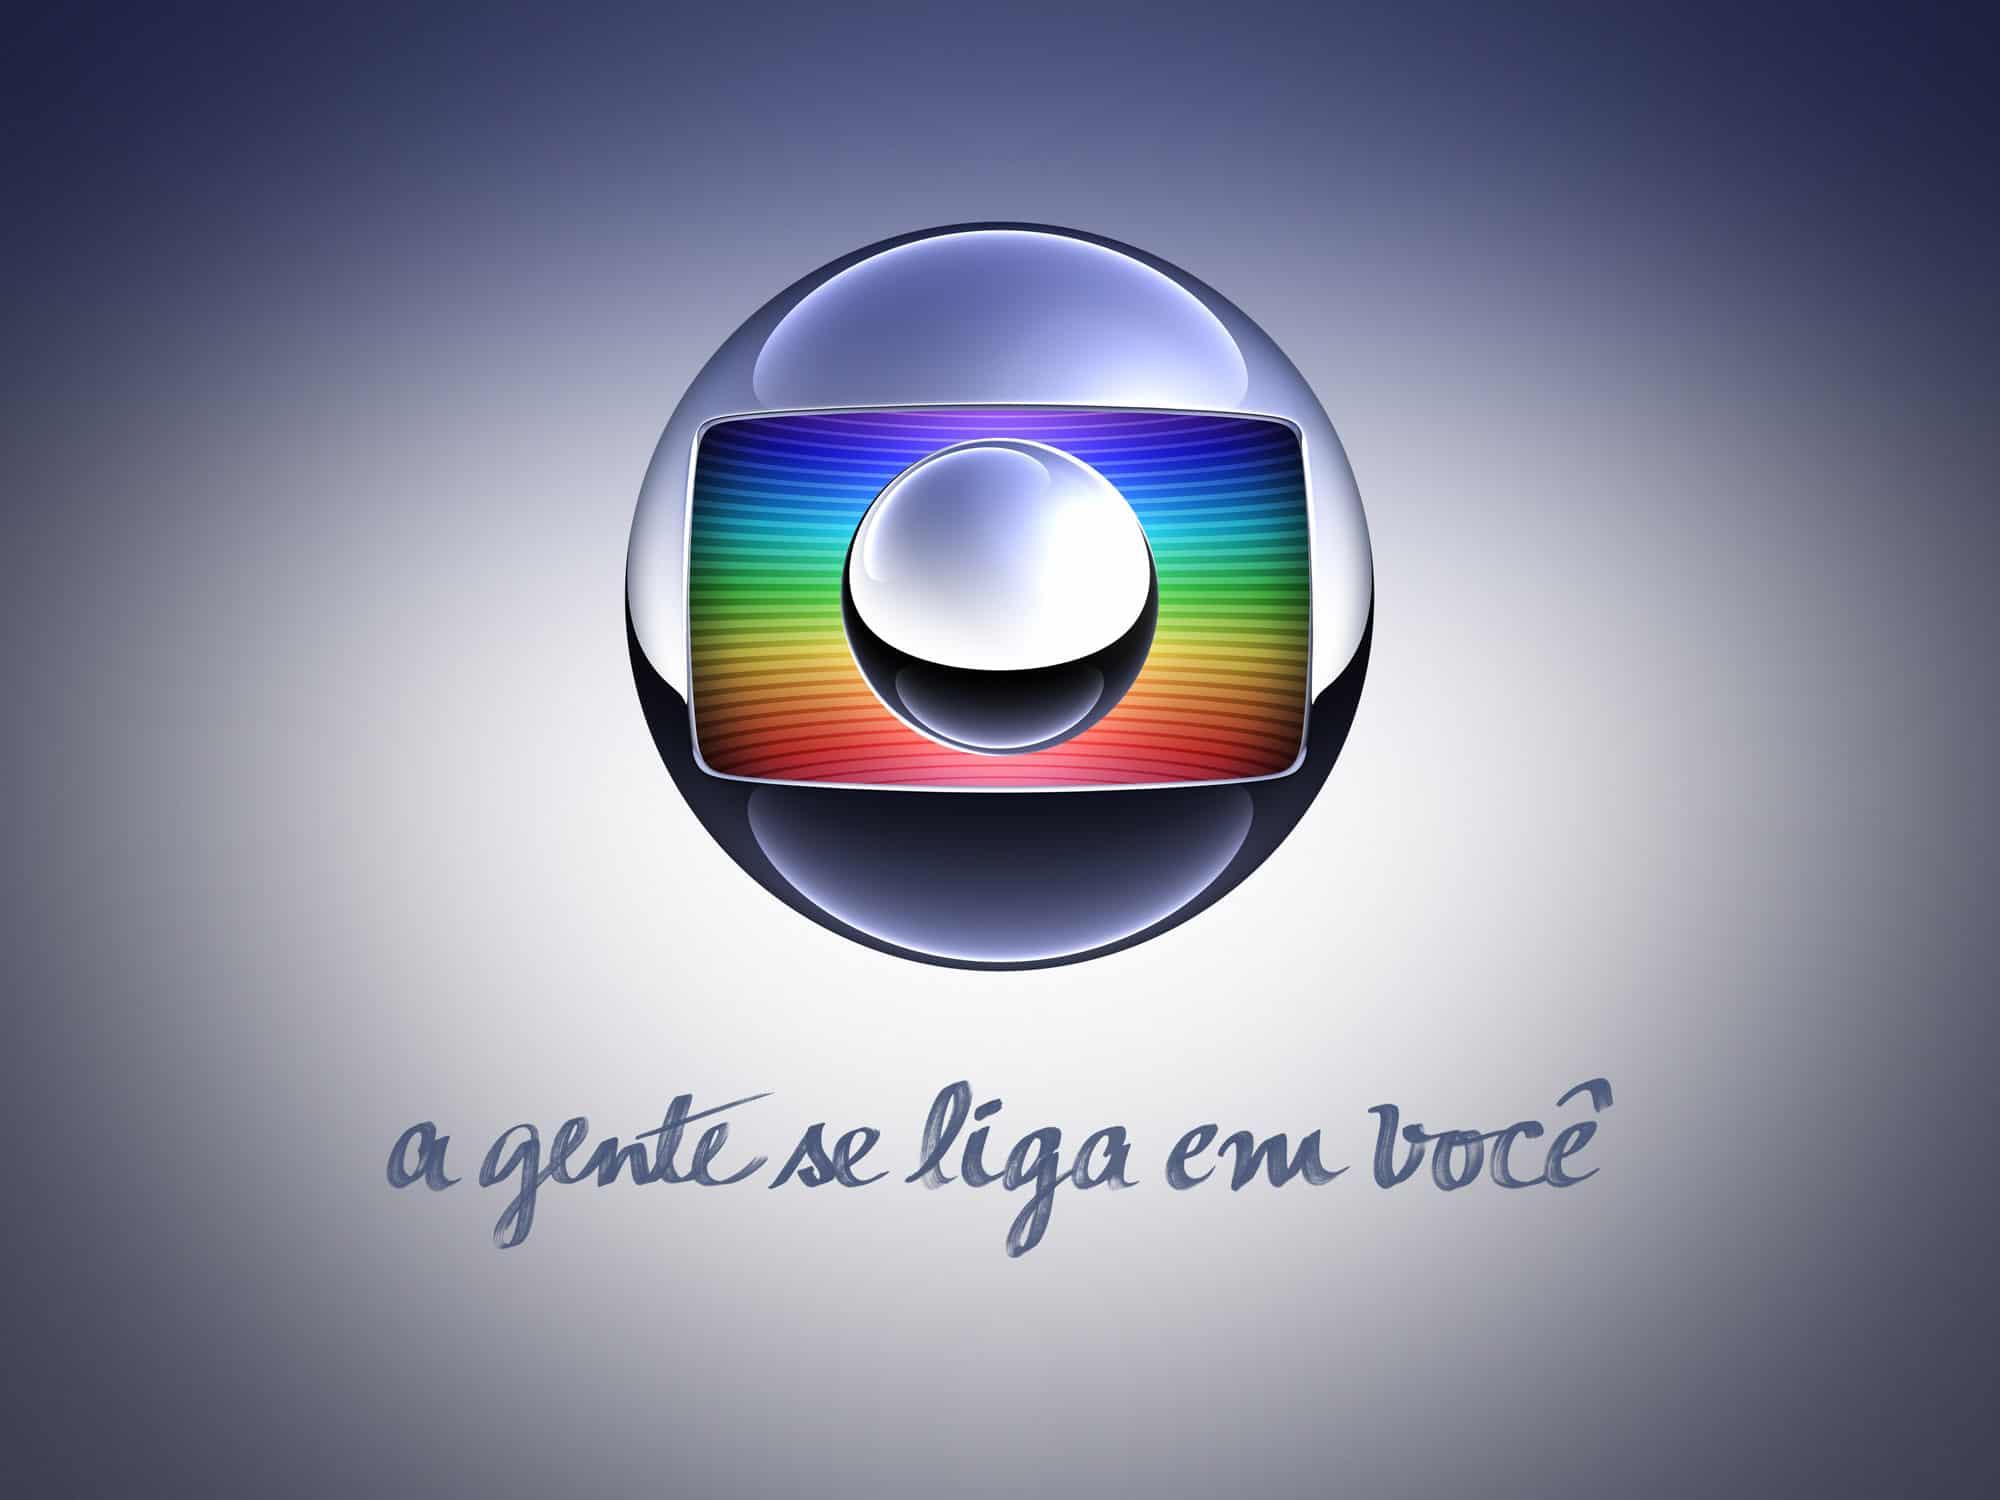 Globo mudará novamente de slogan: rd1.ig.com.br/televisao/globo-mudara-novamente-de-slogan/167700